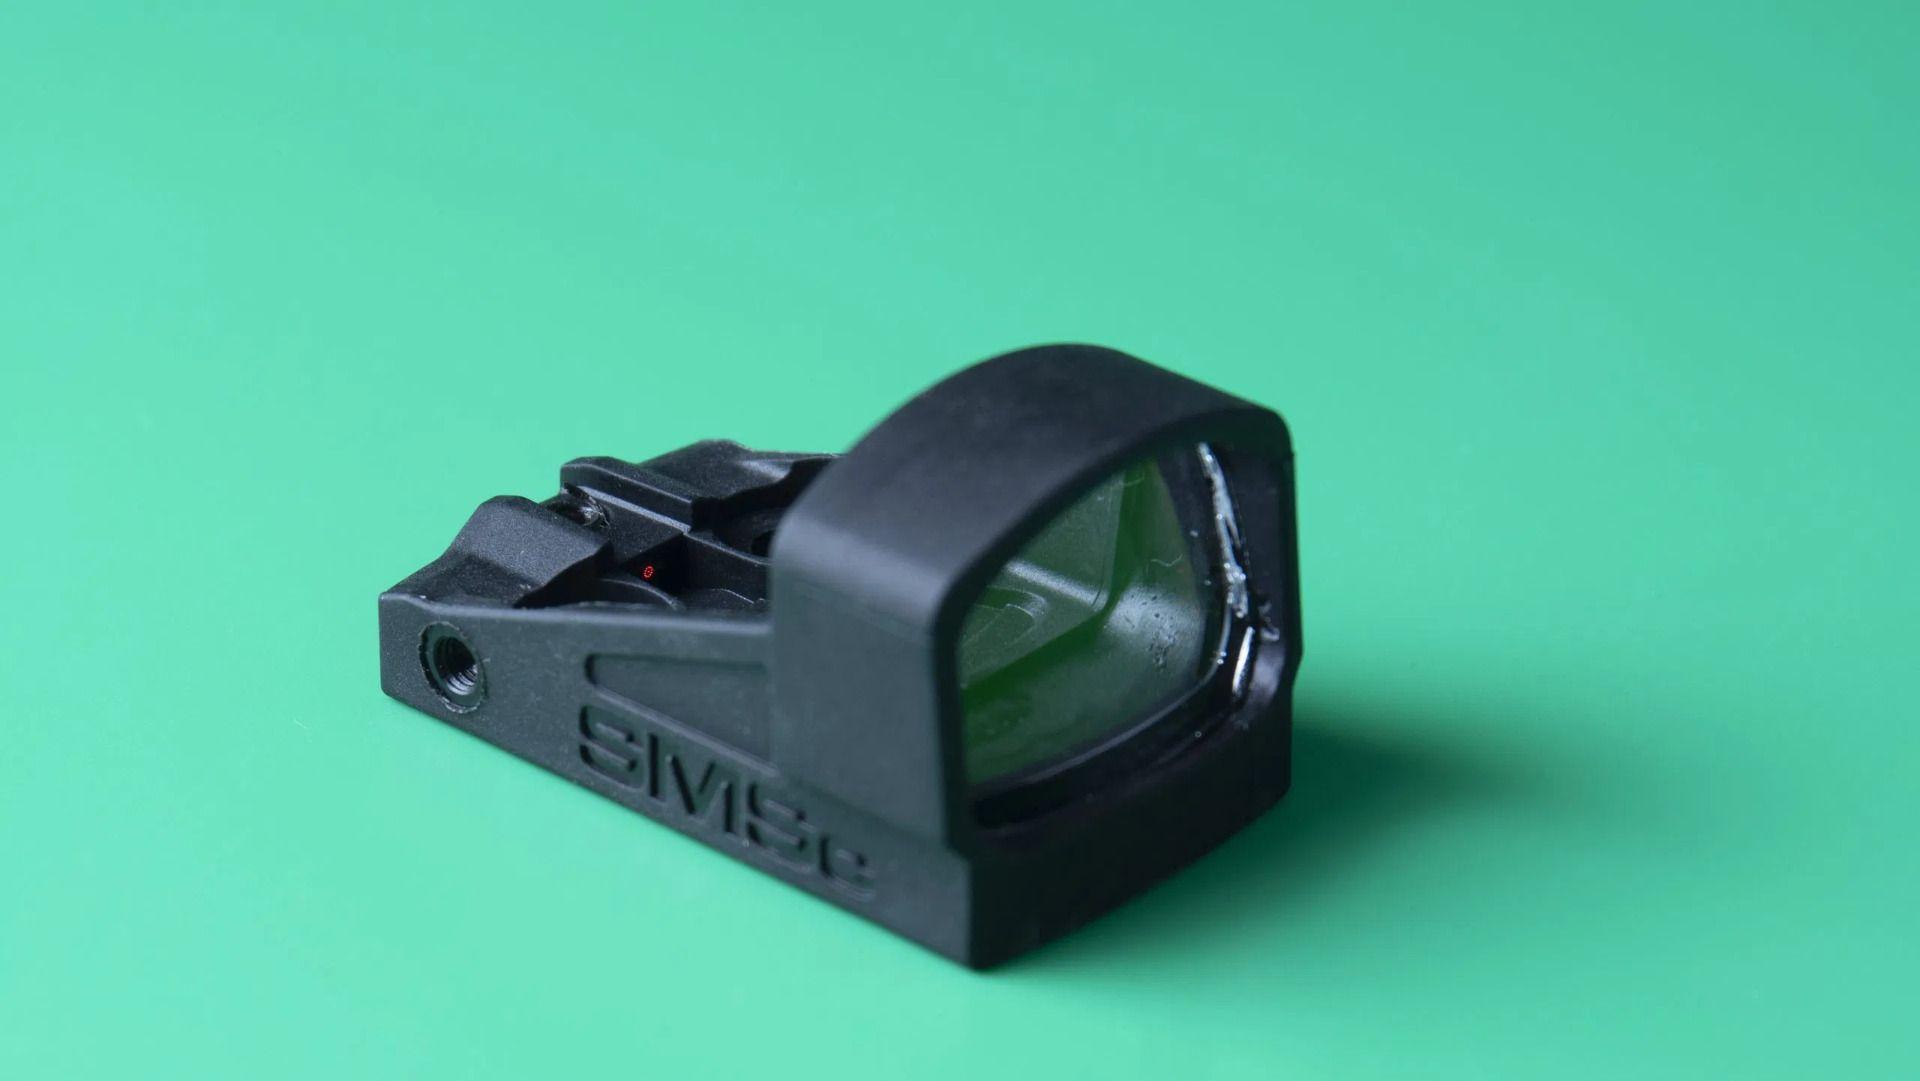 Shield SMSc 4 MOA Red Dot Mini Sight